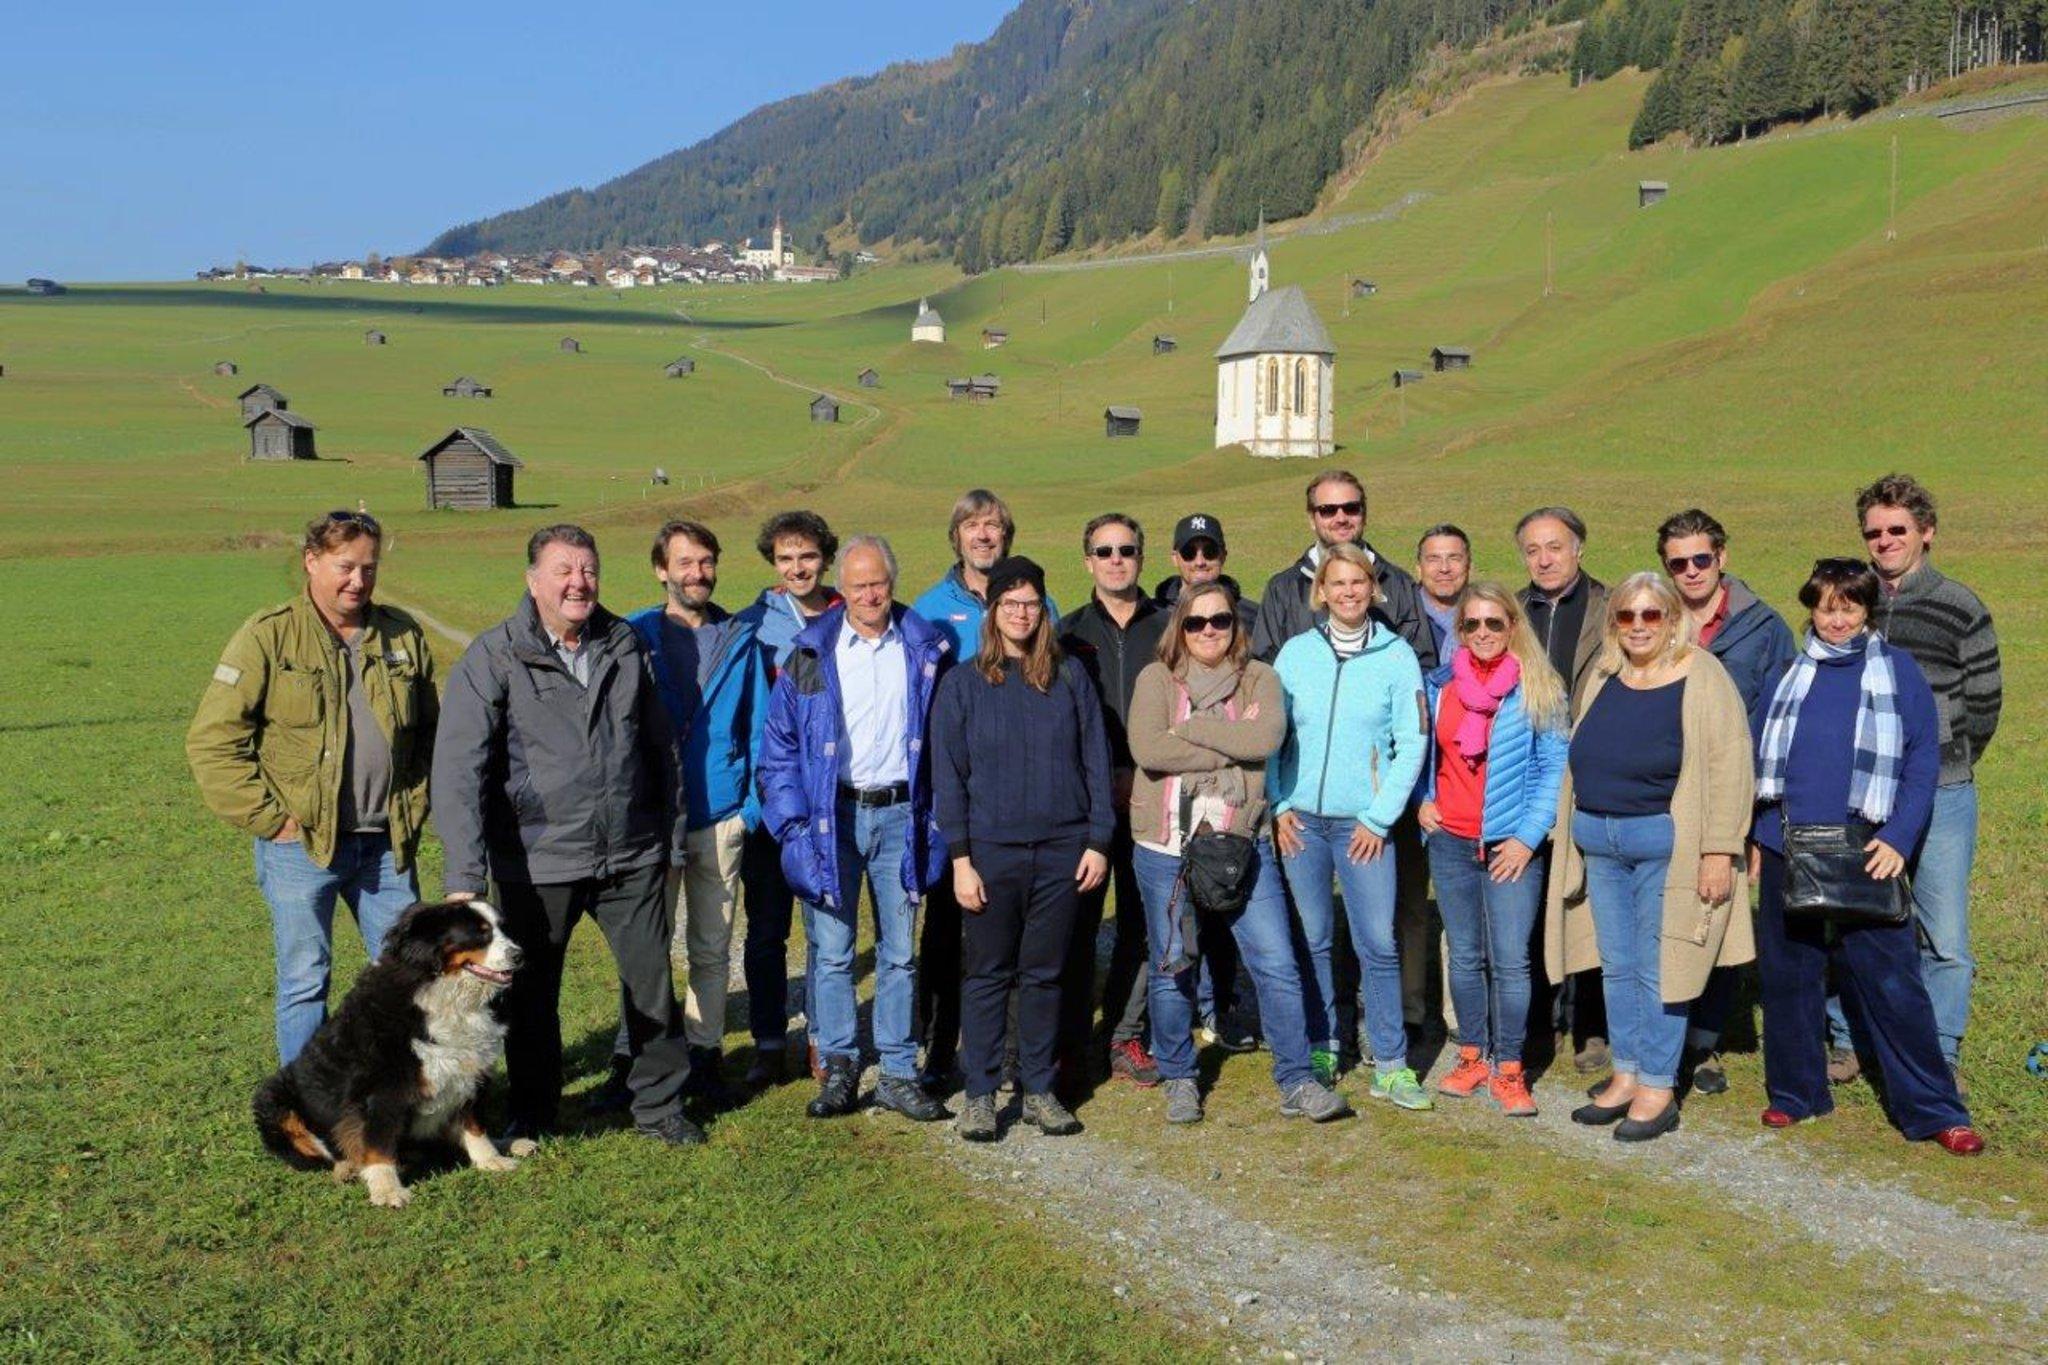 Familienurlaub im Sommer - Osttirol | Tirol